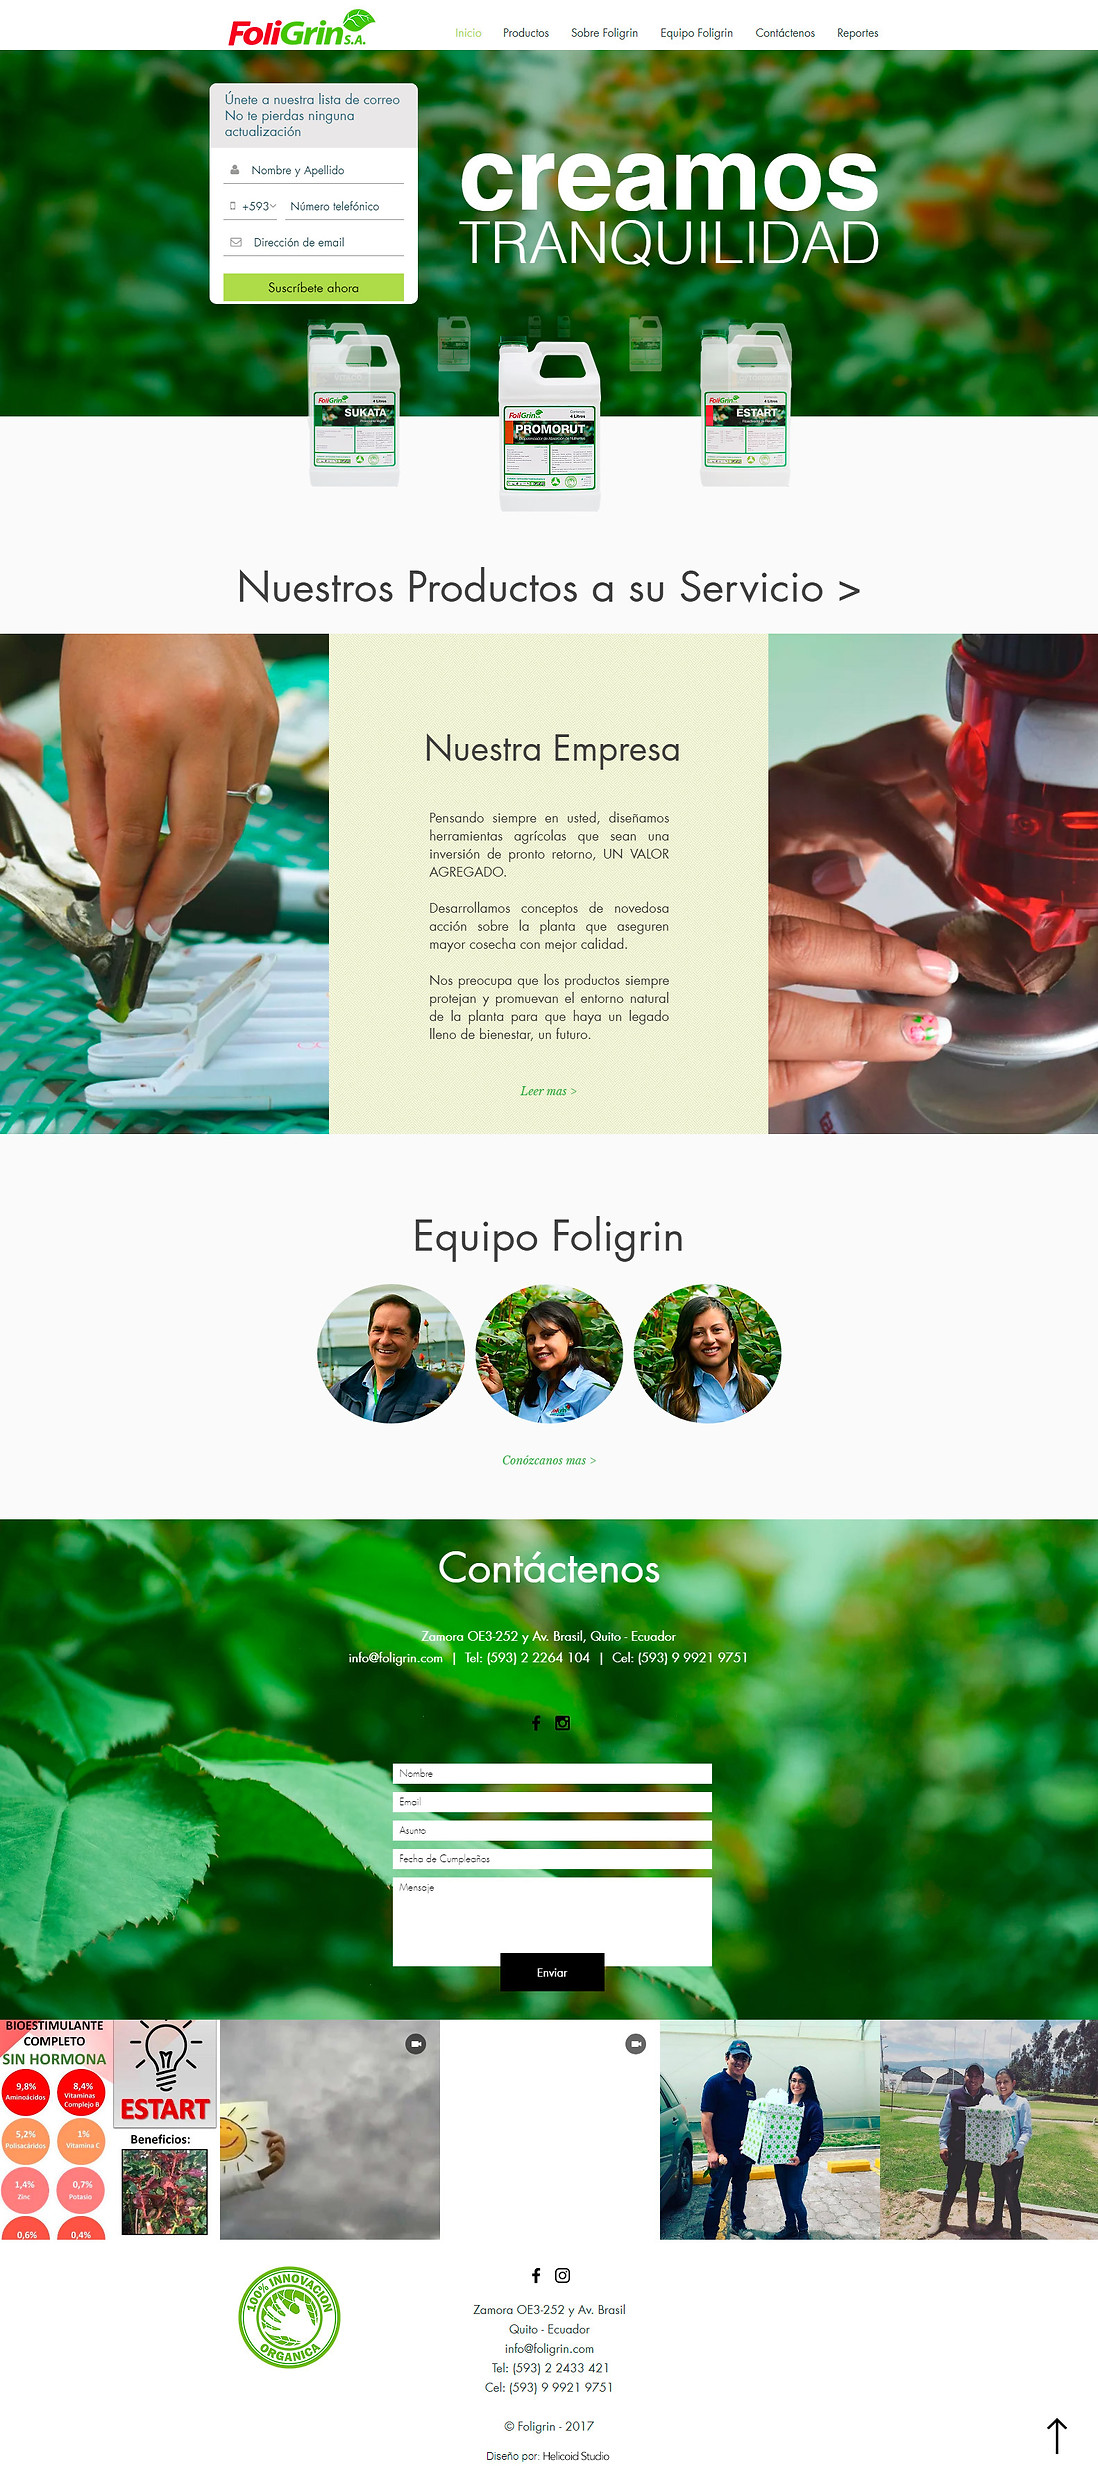 Foligrin S.A. Website Design